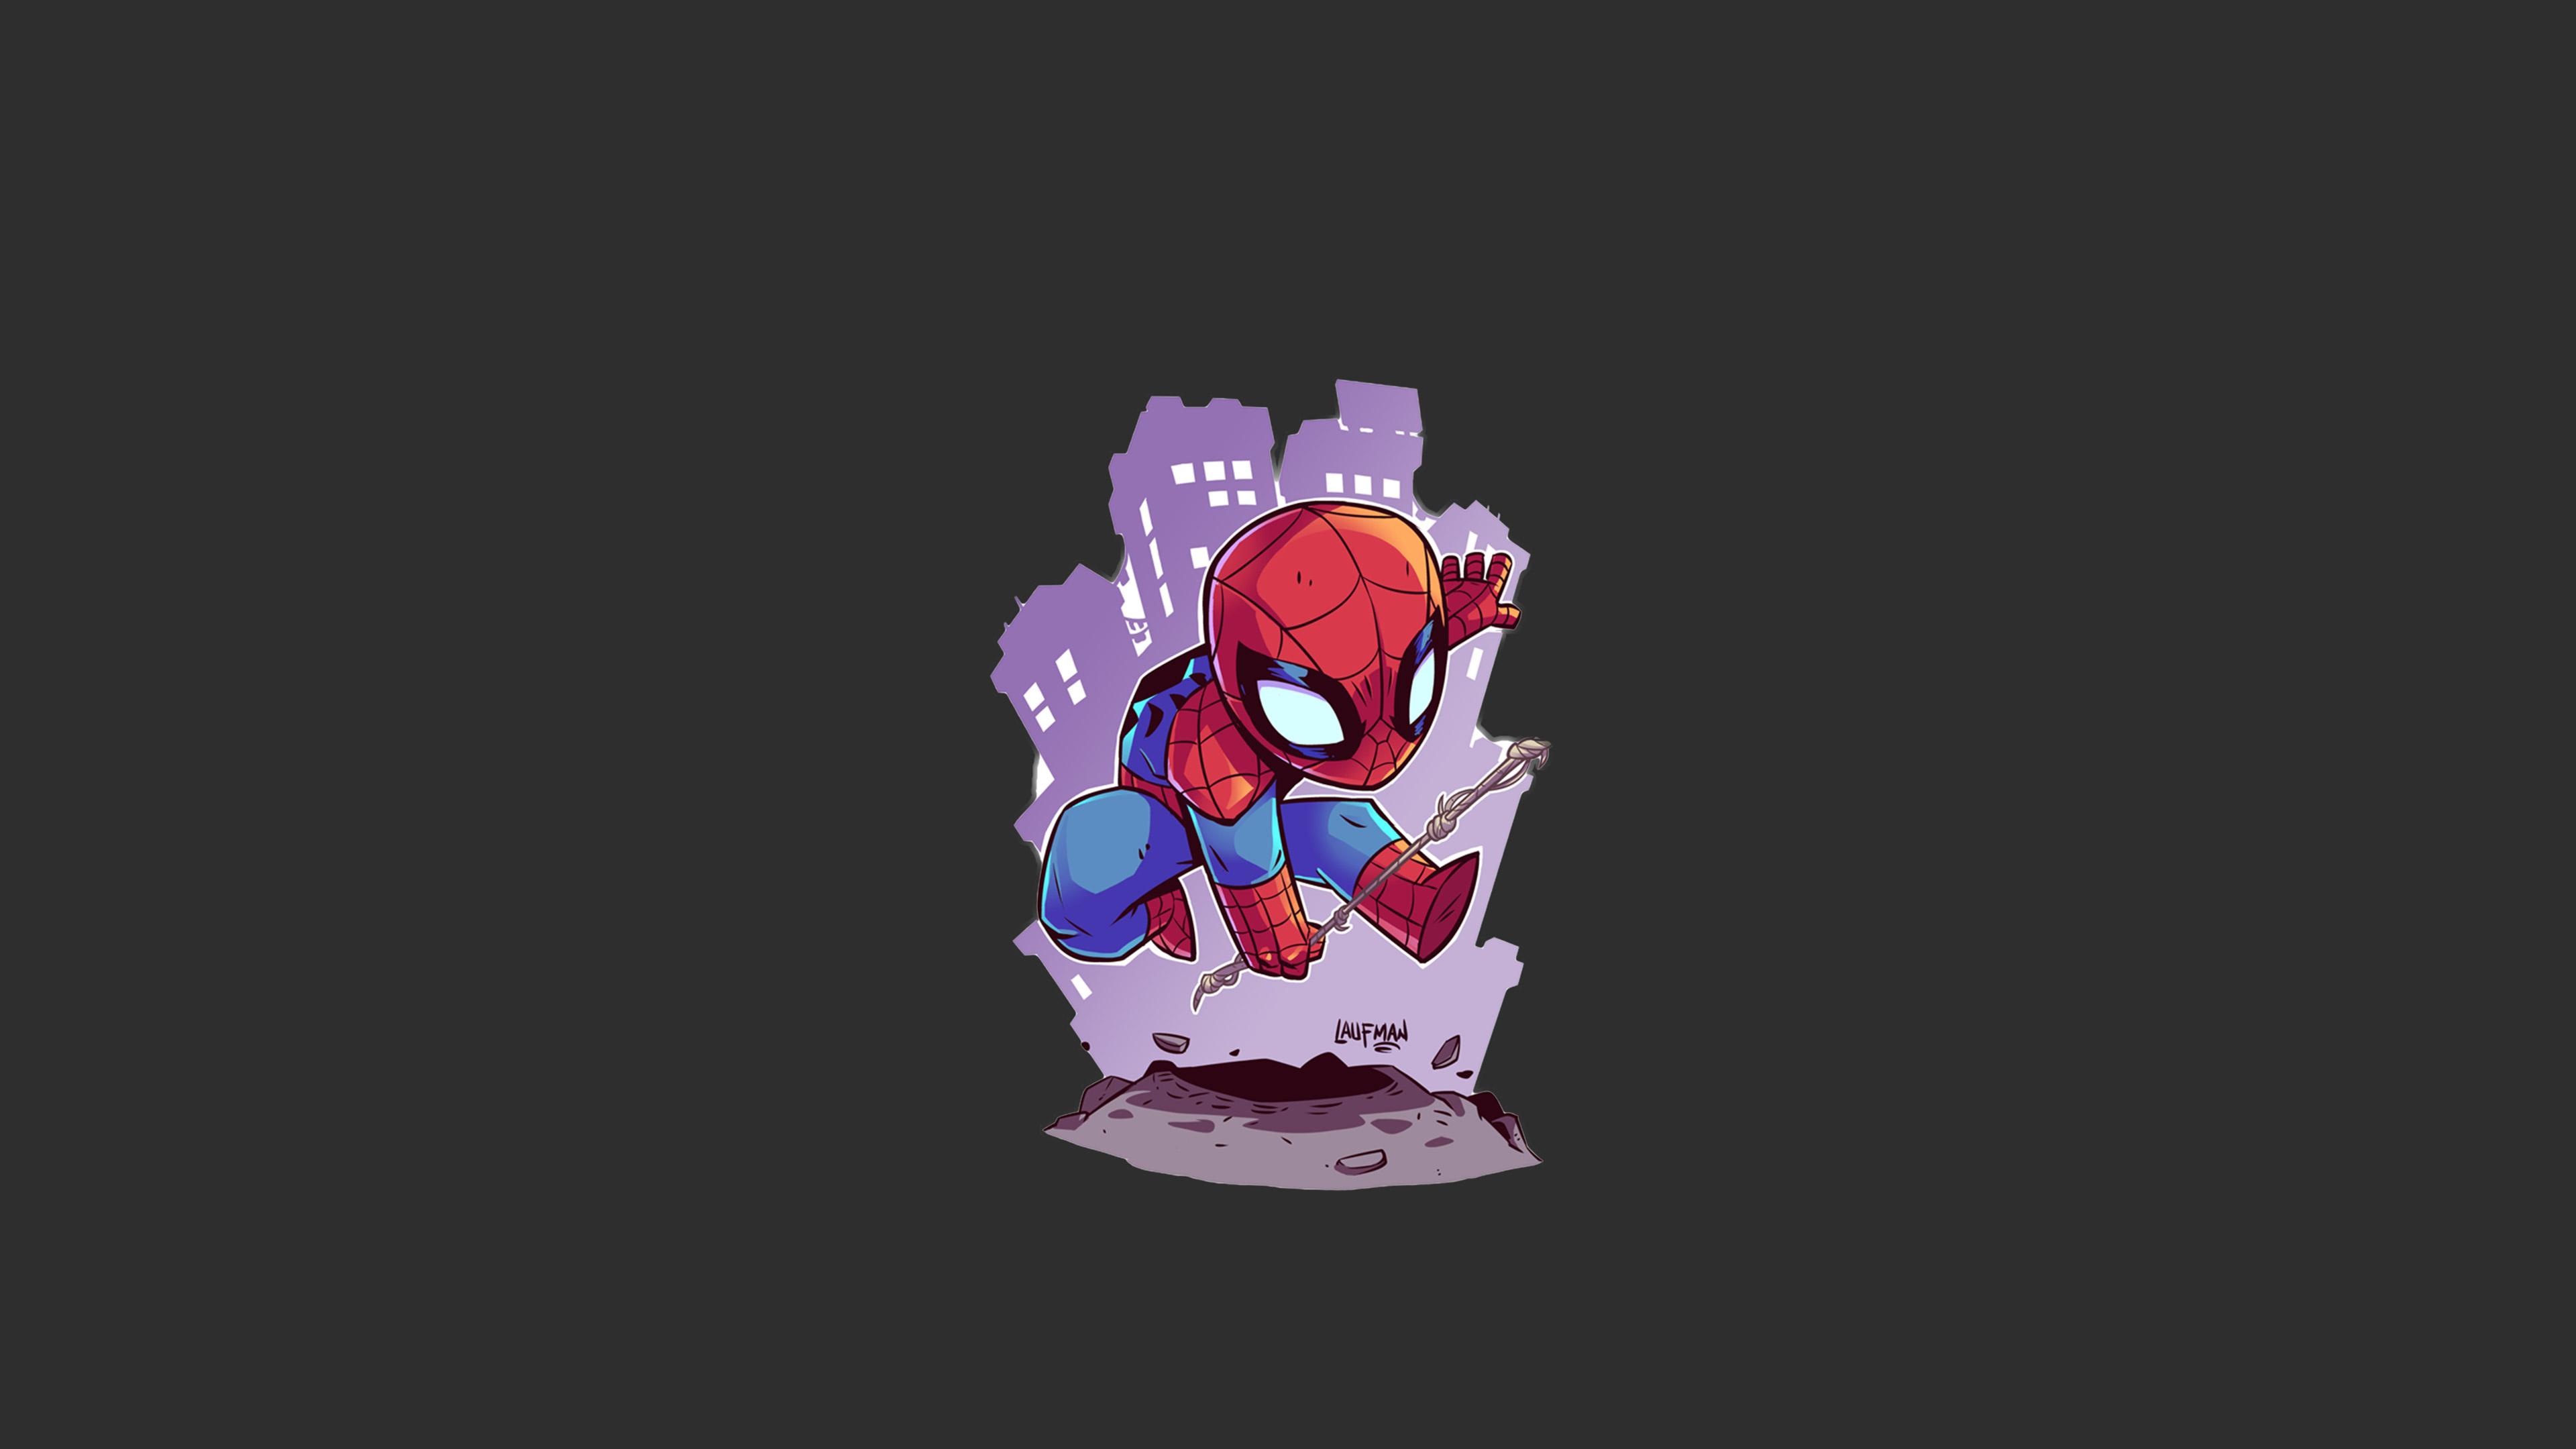 spiderman minimalism 4k 1540749008 - Spiderman Minimalism 4k - spiderman wallpapers, minimalism wallpapers, artist wallpapers